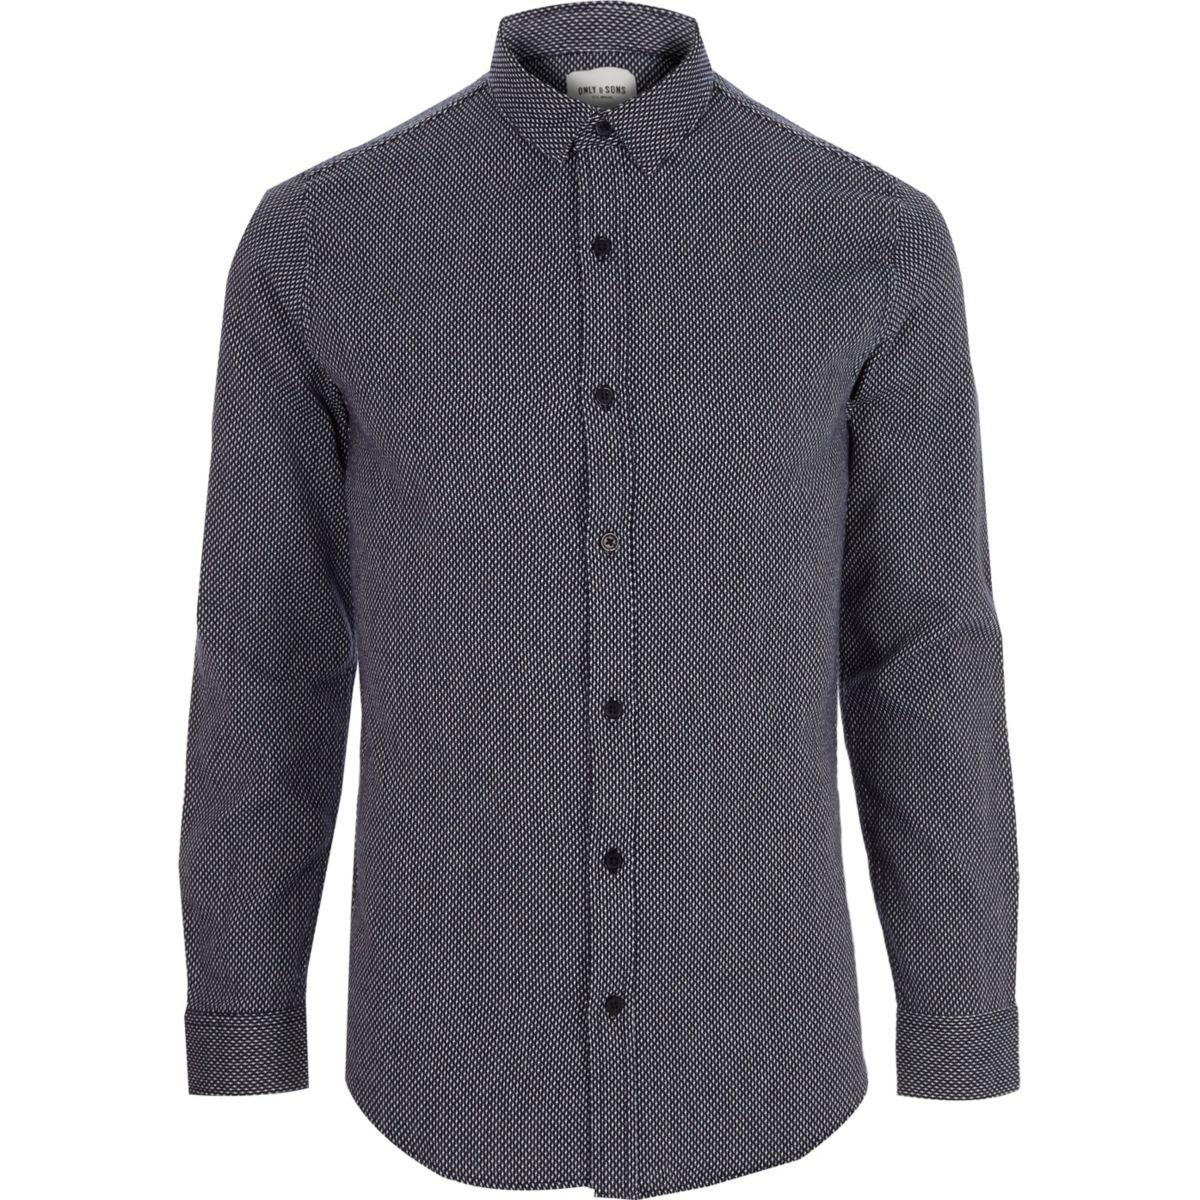 Only & Sons navy jacquard long sleeve shirt